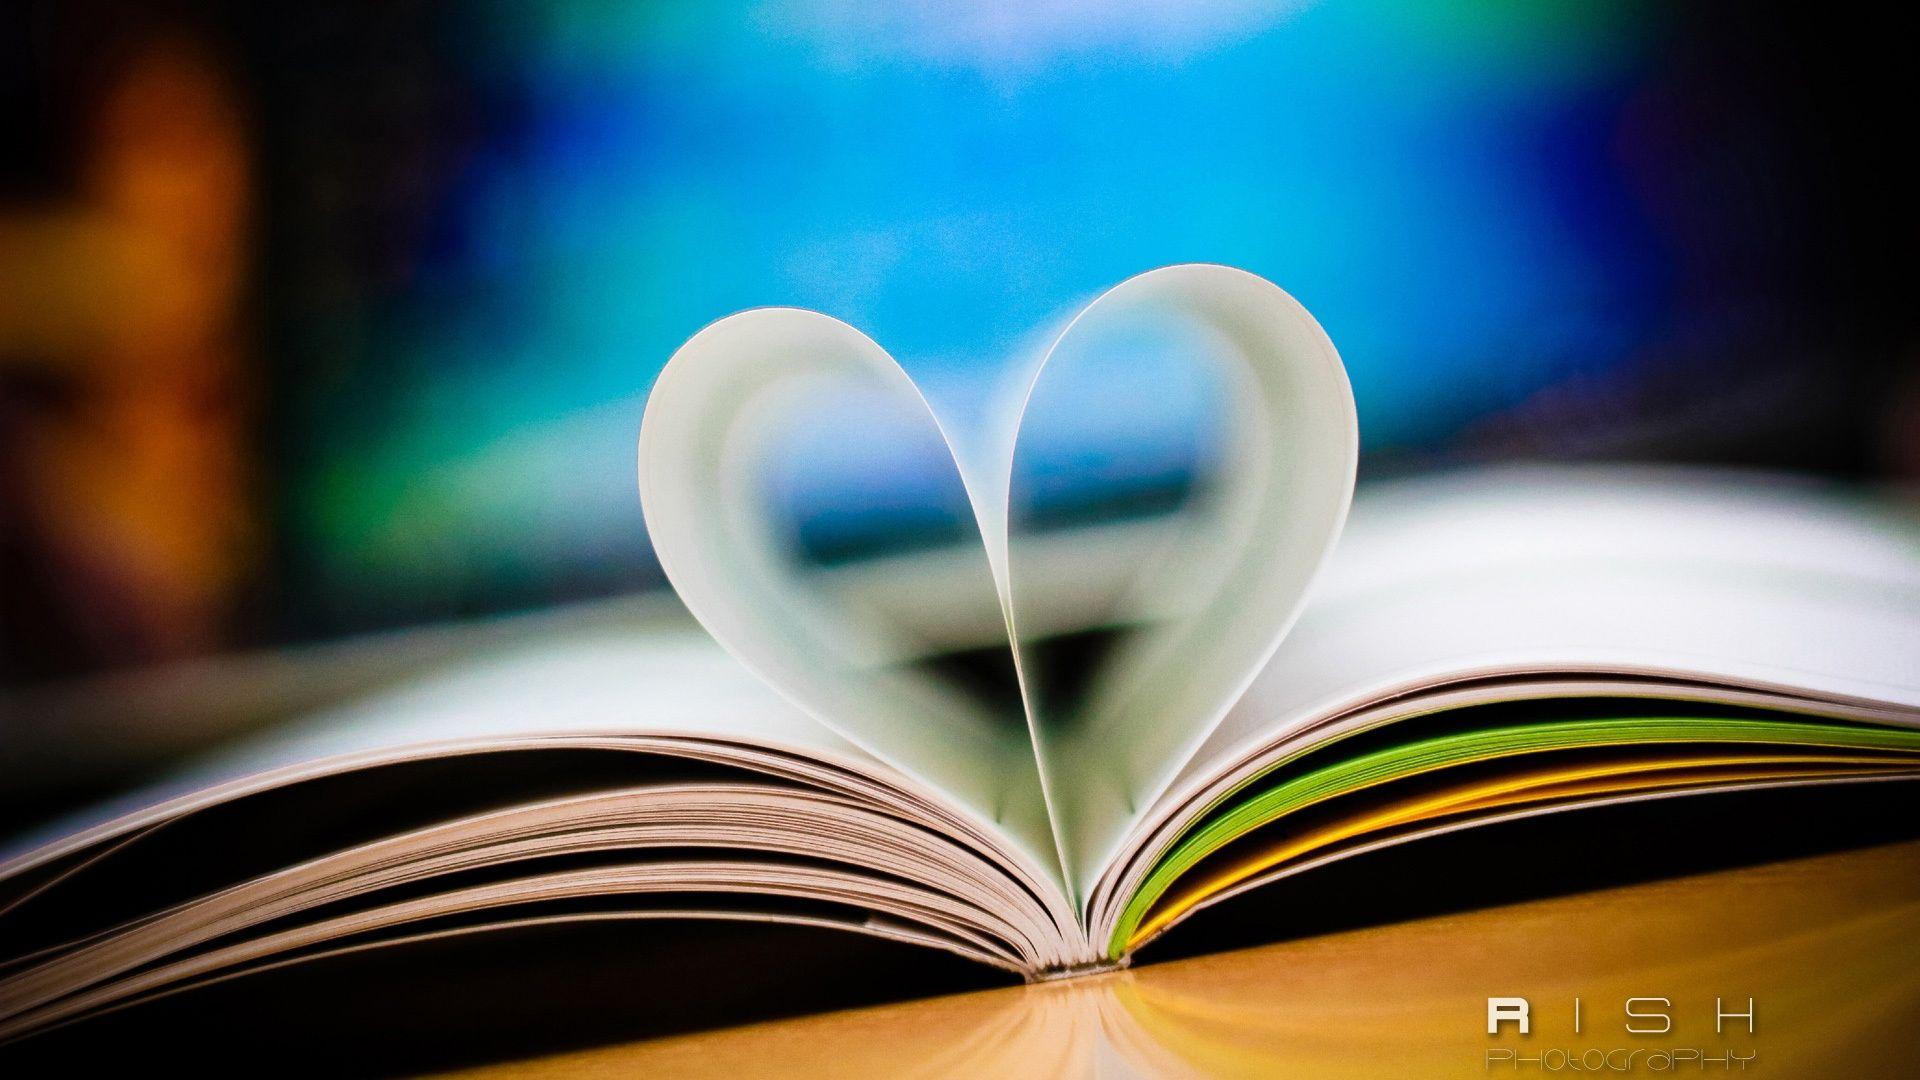 Love Book Hd 1080p Wallpapers Download Book Wallpaper